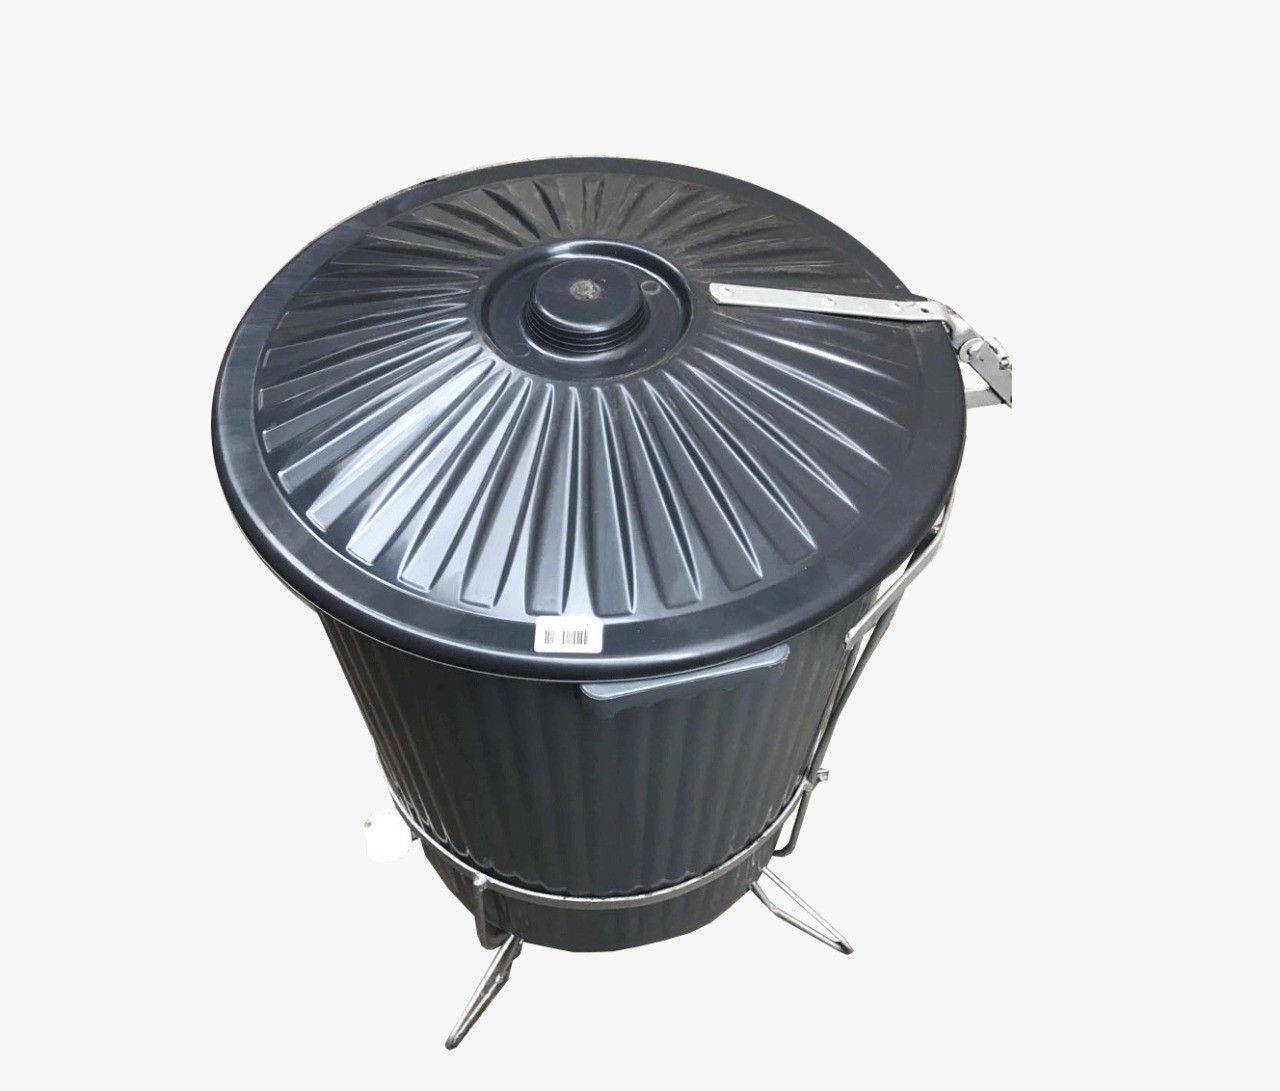 Lixeira Industrial c/ Pedal 60 Litros Popax